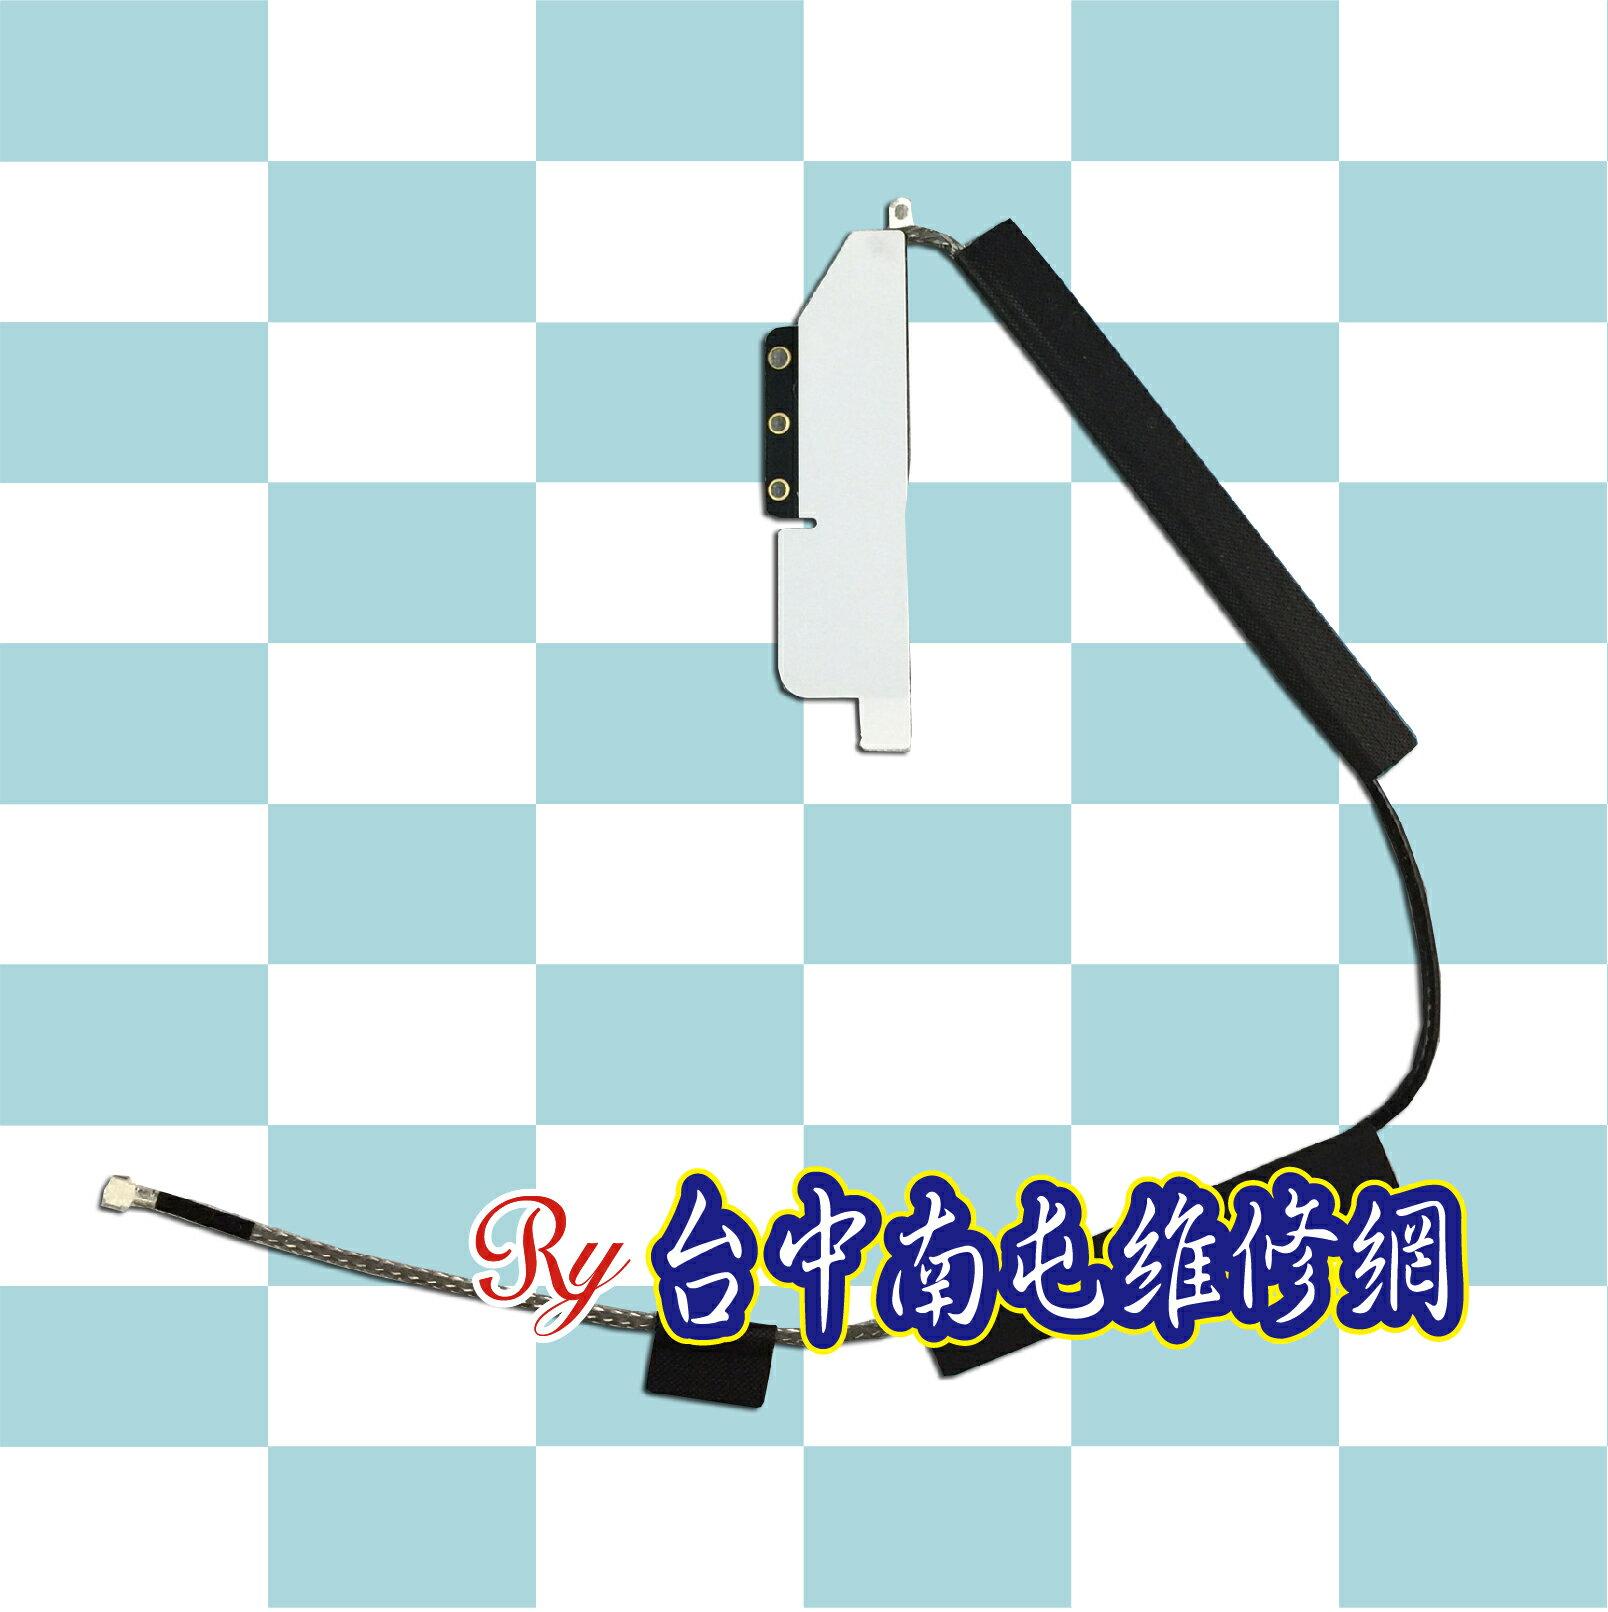 Apple ipad mini4 wifi天線 DIY價 450元-Ry台中南屯維修網